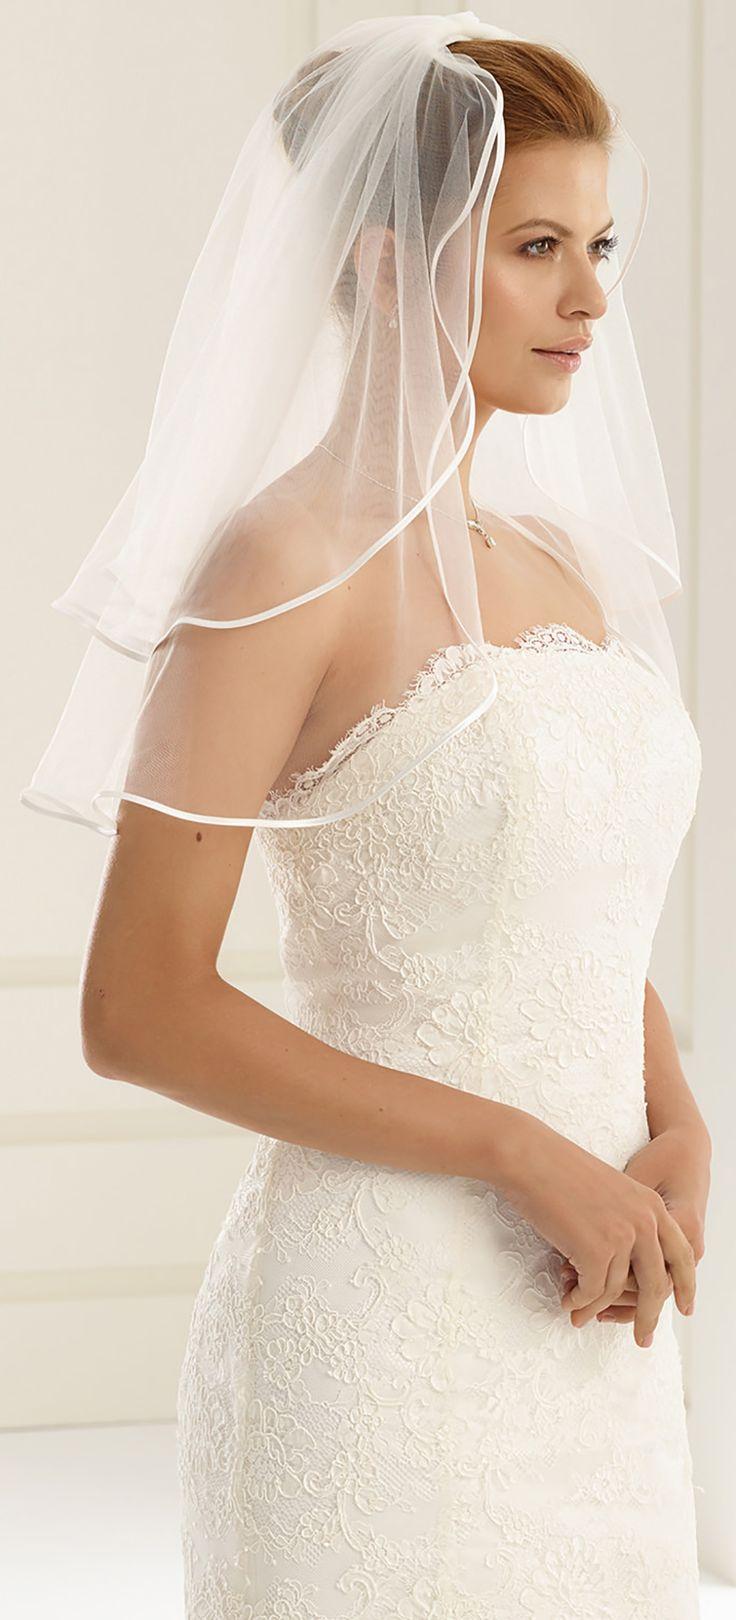 Fabulous veil S3 from Bianco Evento #biancoevento #veil #weddingdress #weddingideas #bridetobe